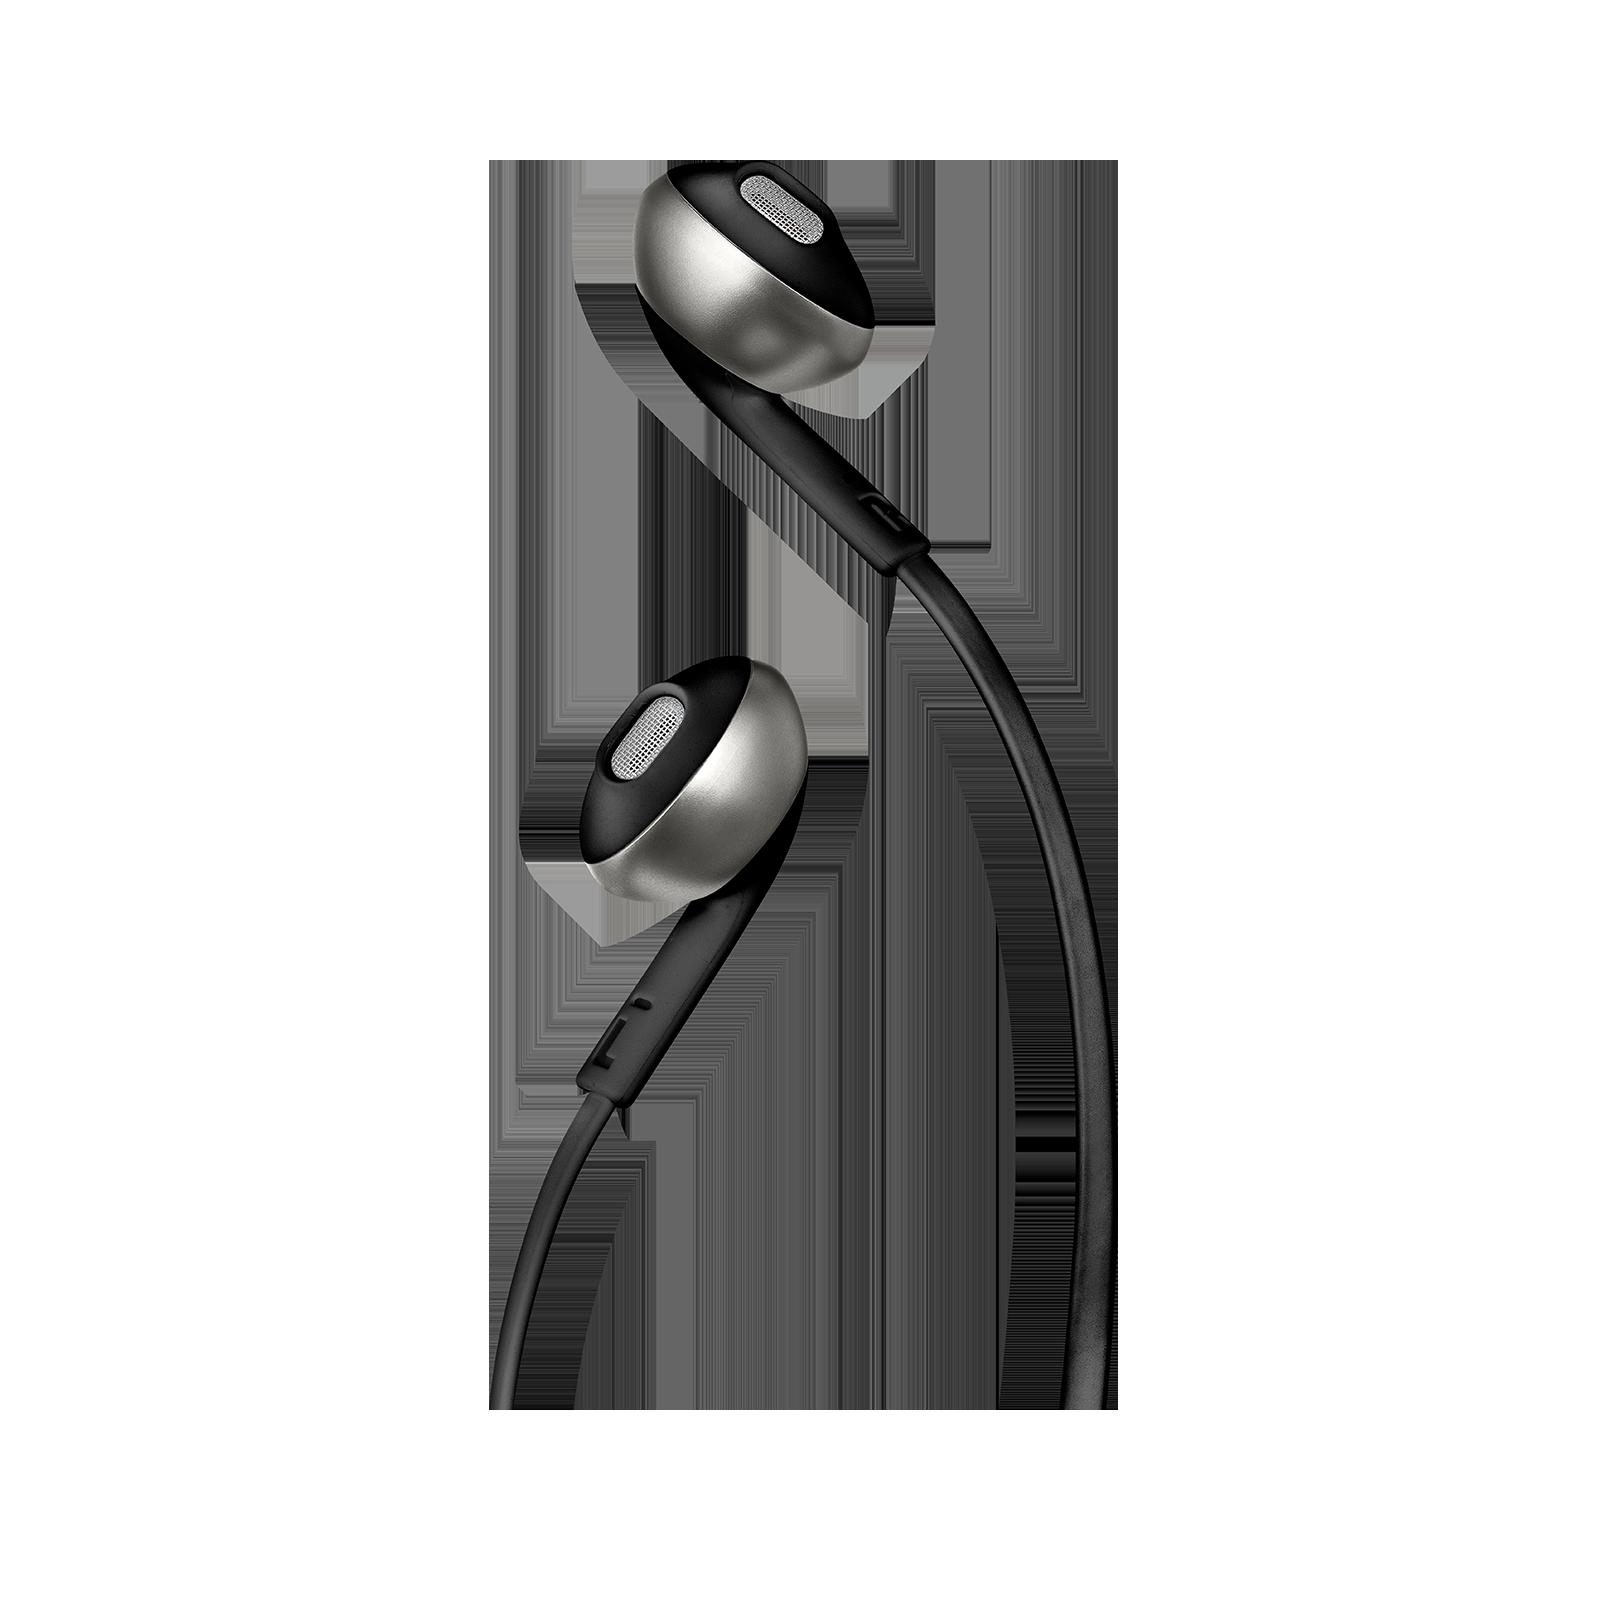 JBL TUNE 205BT - Black - Wireless Earbud headphones - Detailshot 1